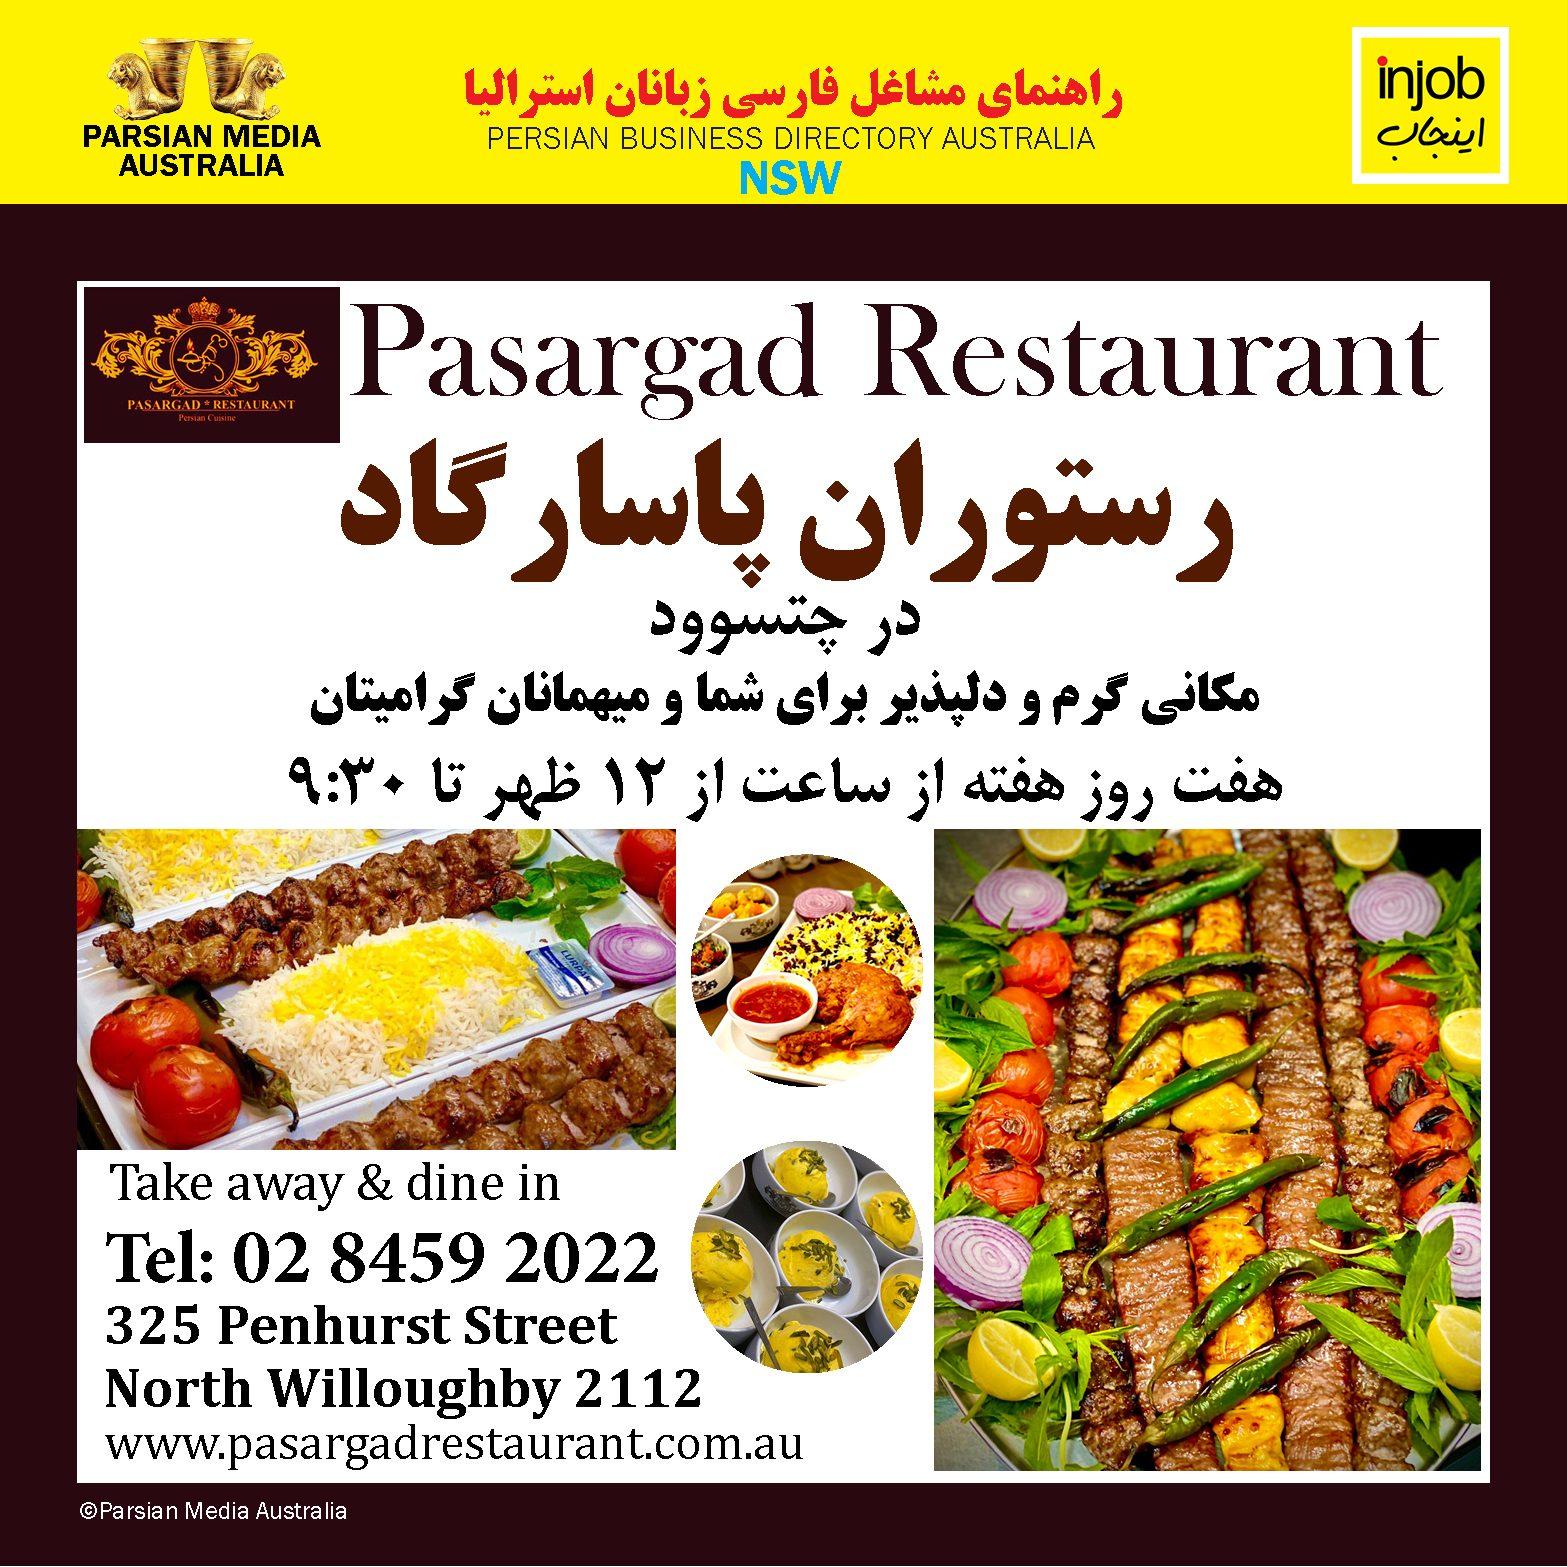 Jamejam-Restaurant-Injob-2021-2022-icon.jpg